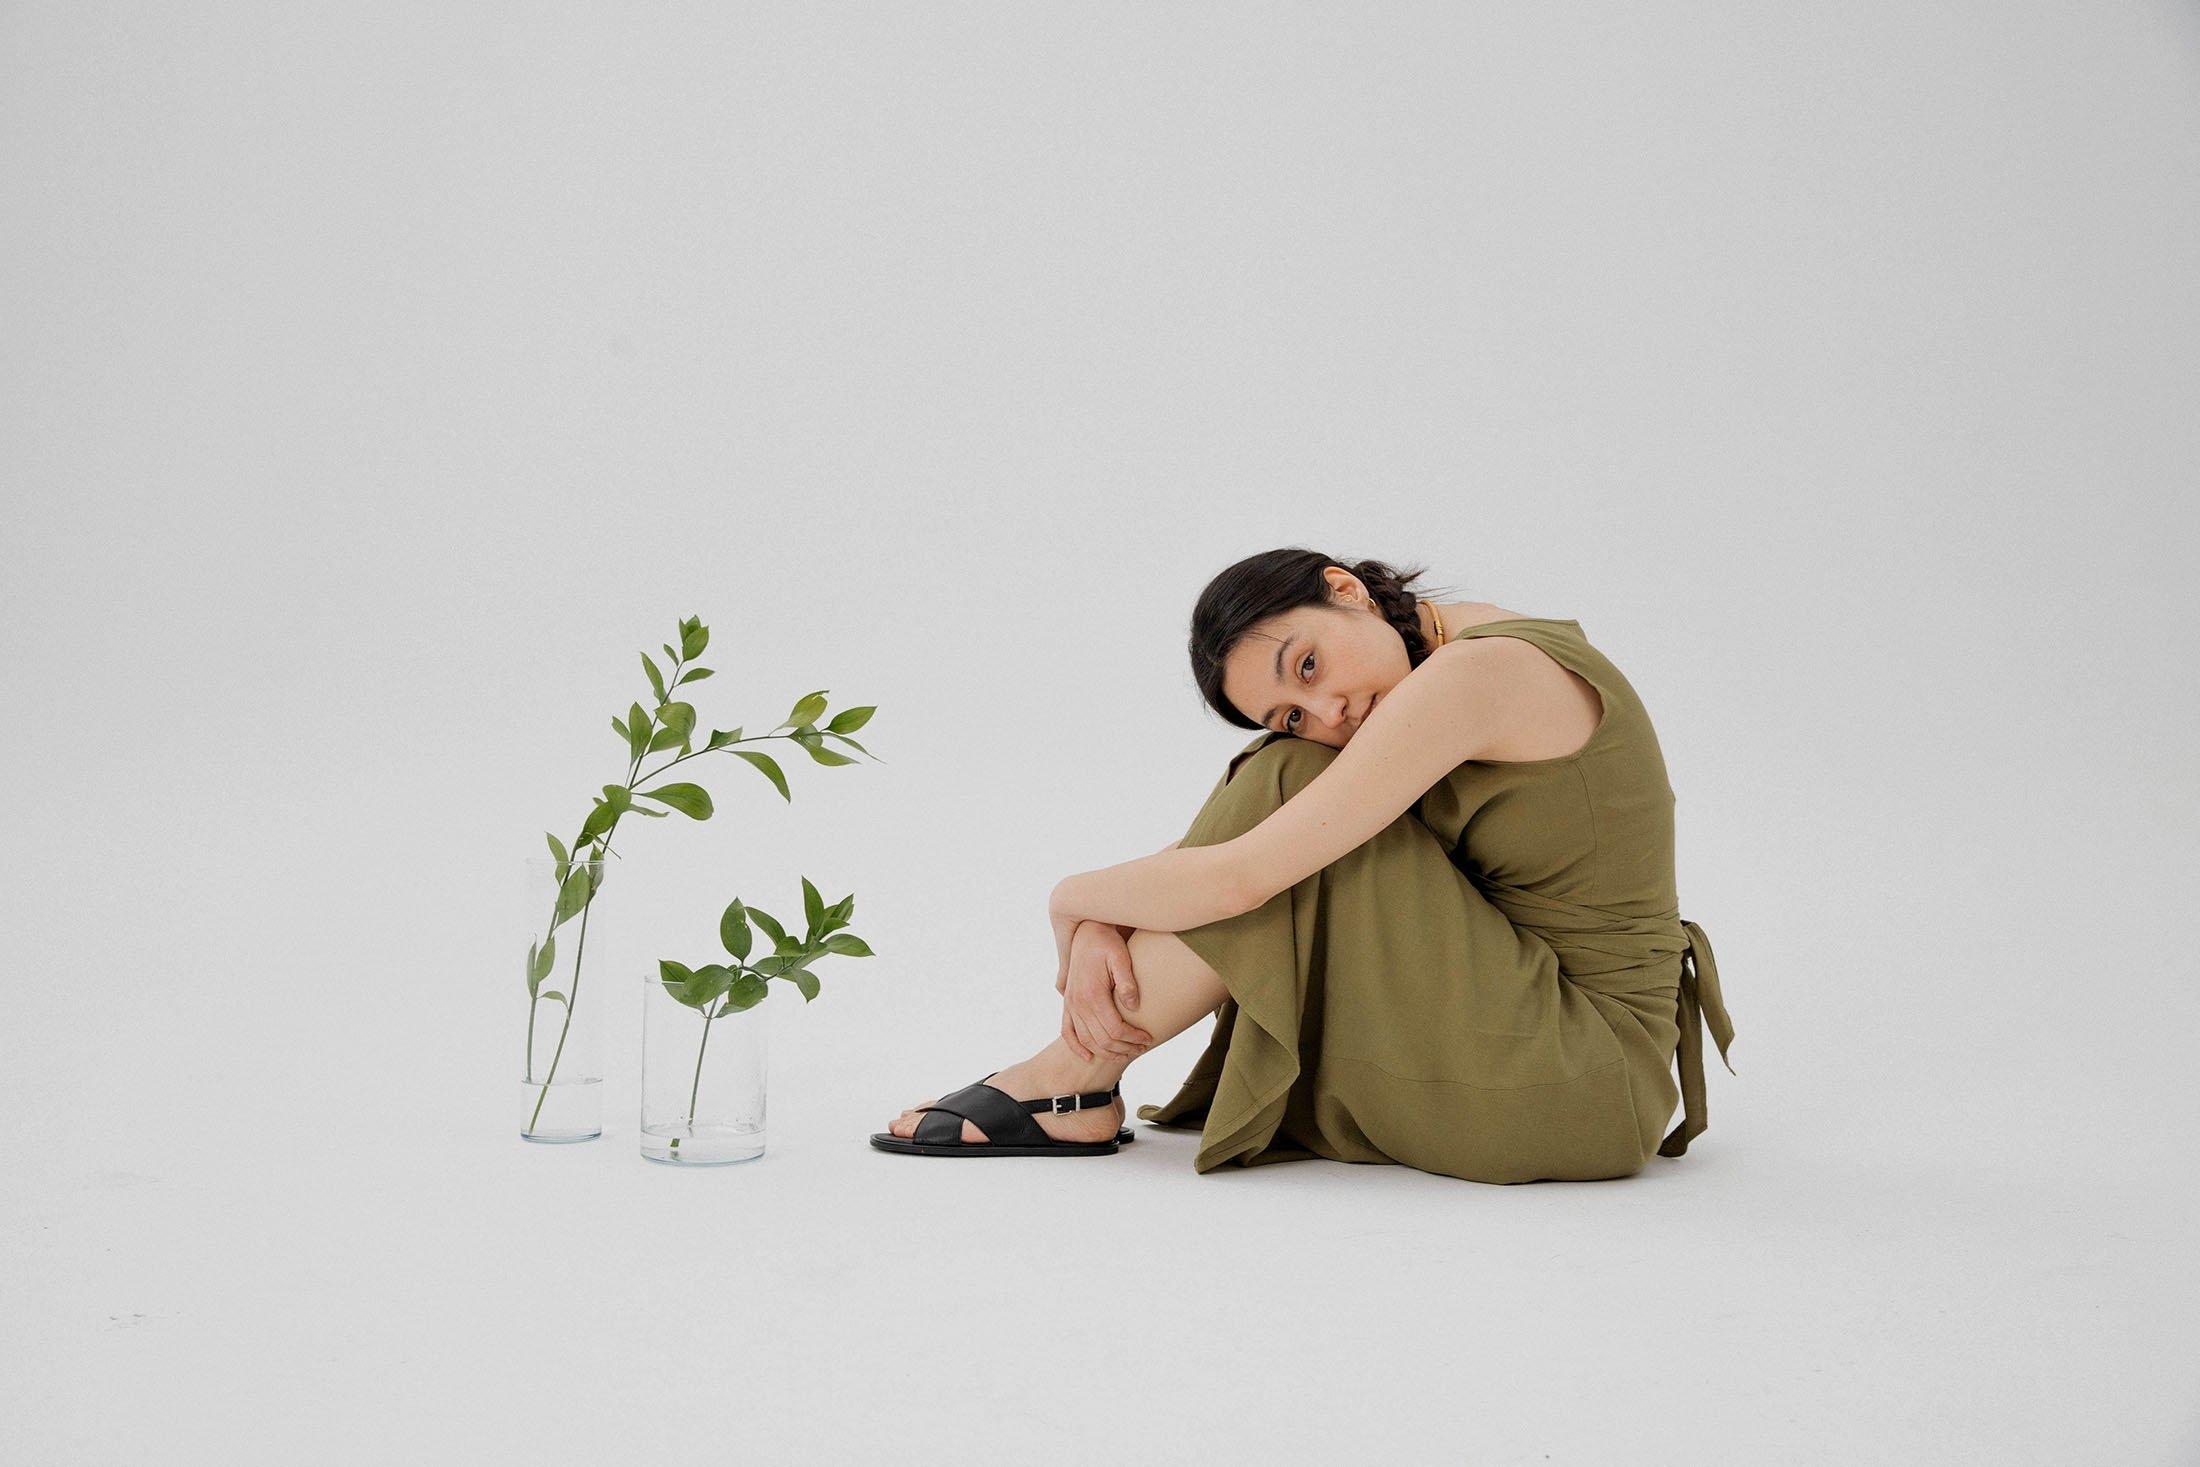 Atölye Ren focuses on environmentally-friendly materials and reducing waste. (Courtesy of Gözde Karatekin)